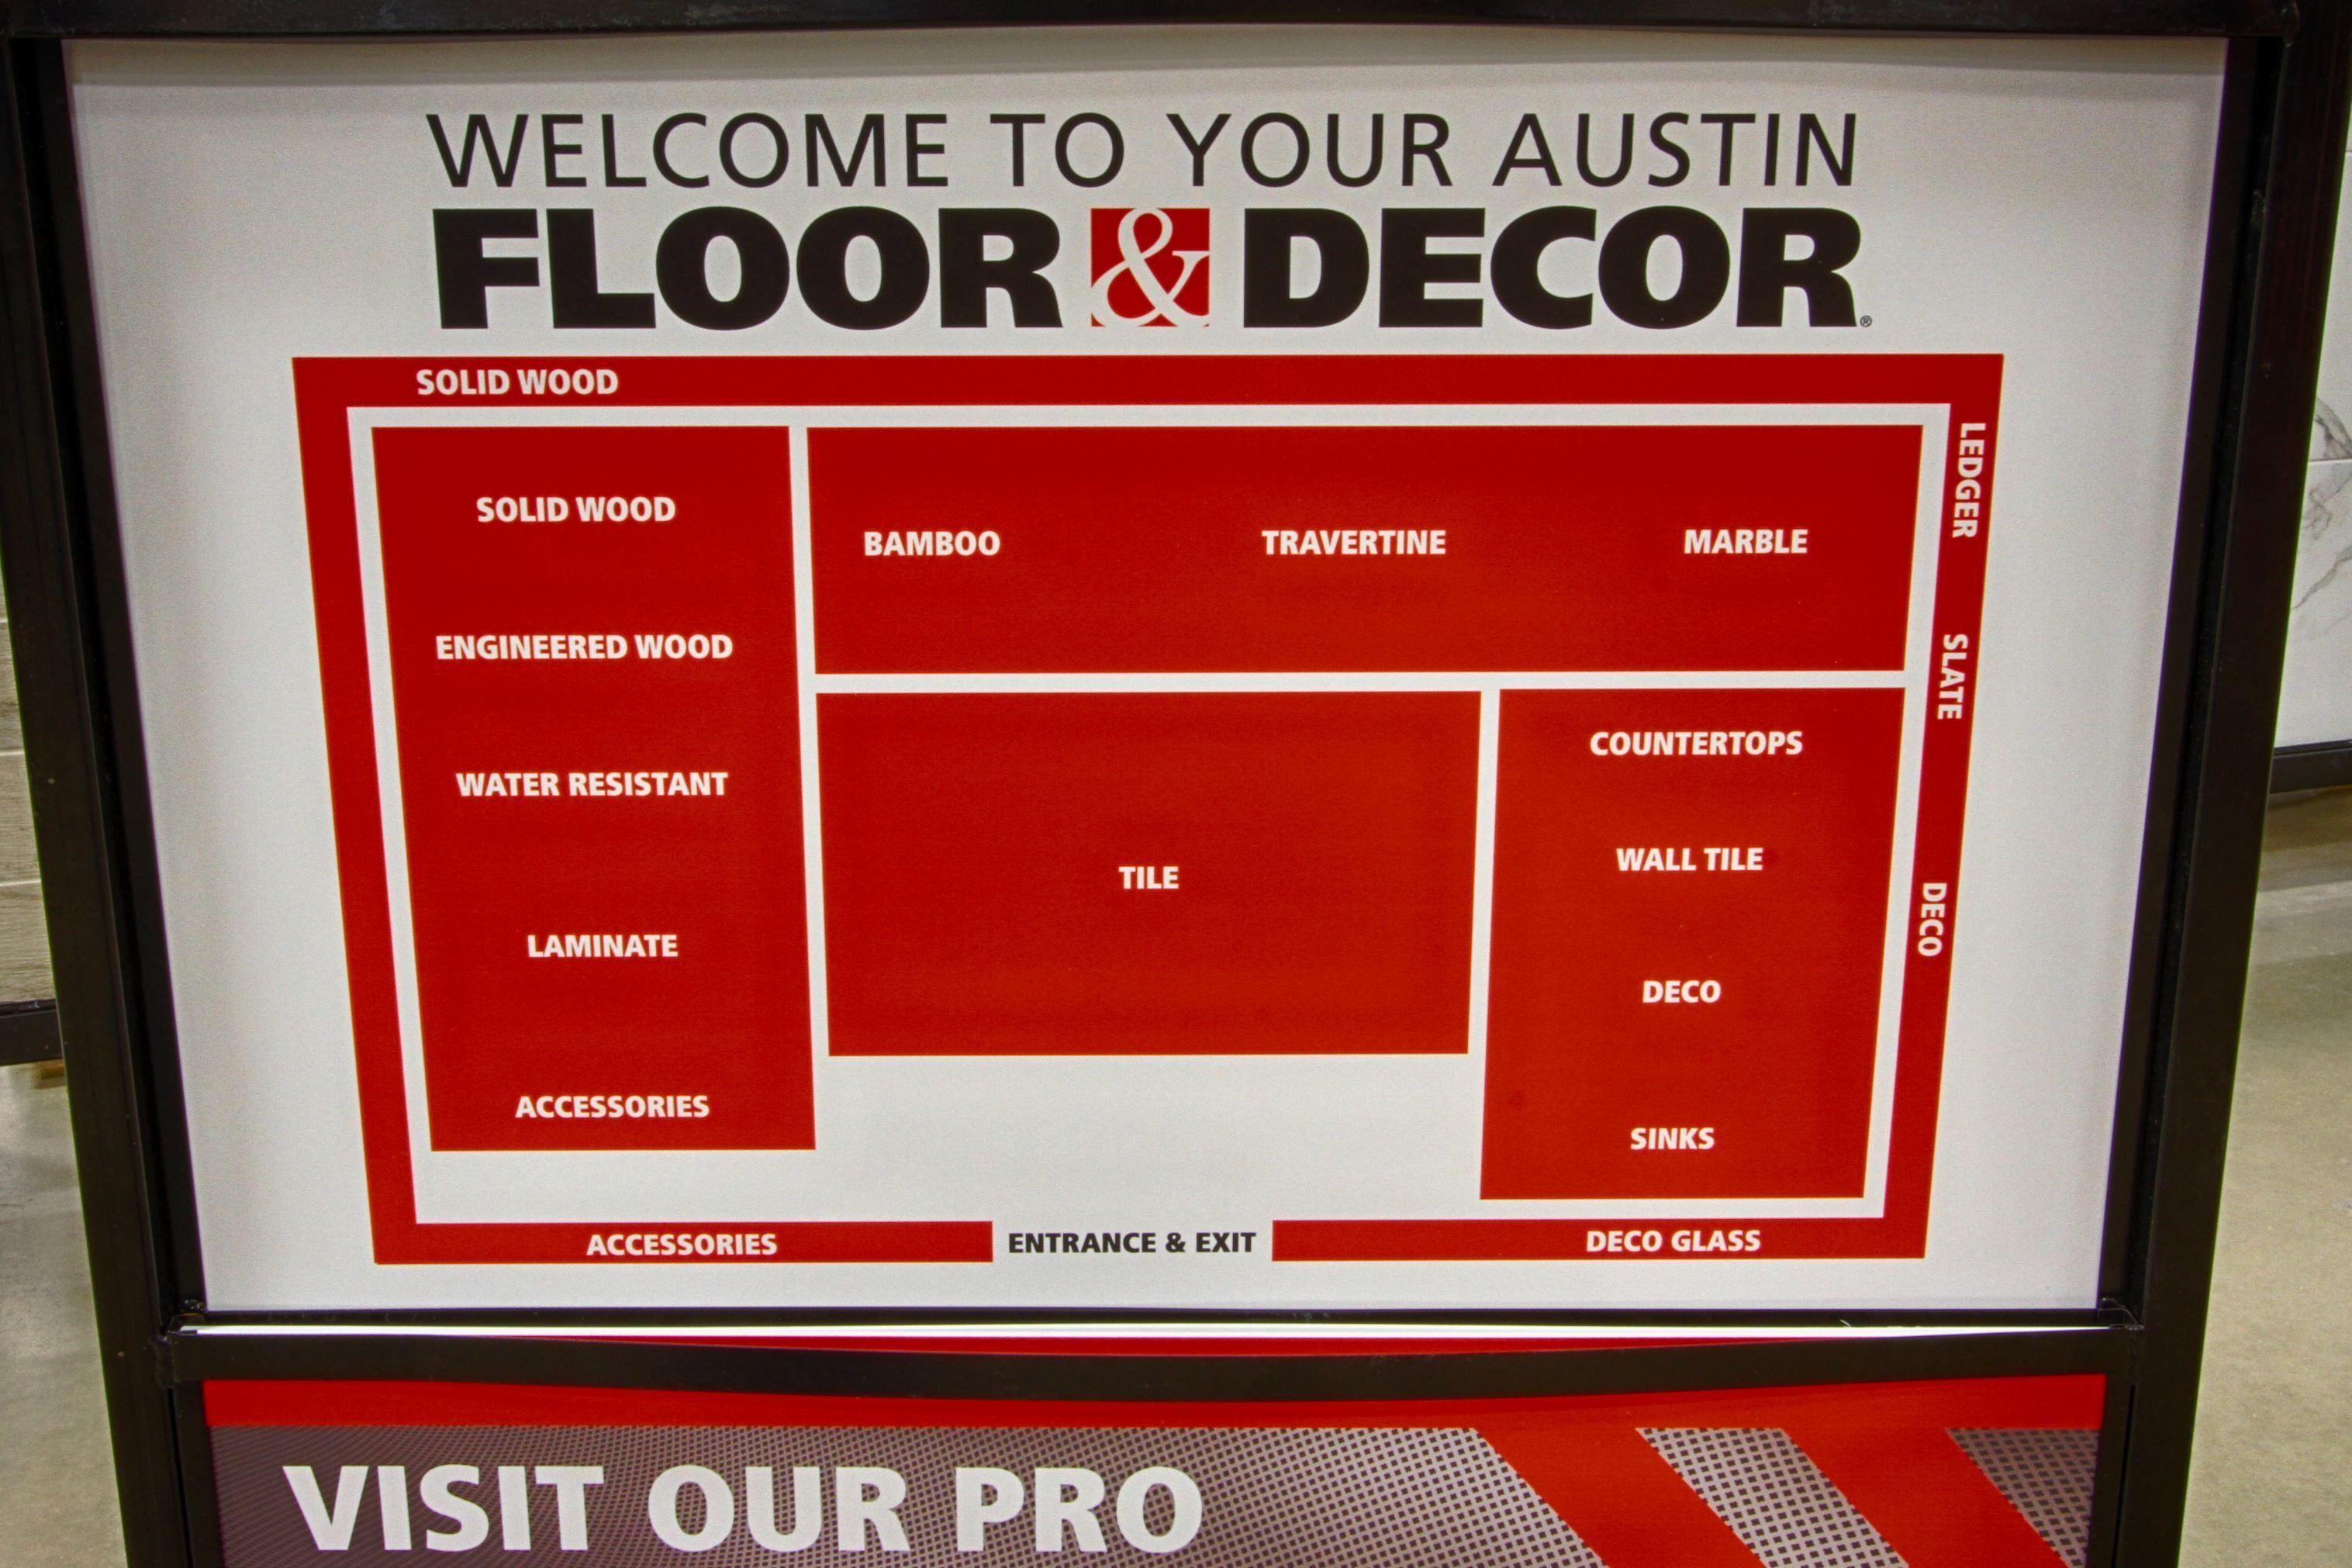 Floor Decor At 4501 W Braker Ln Austin Tx On Fave